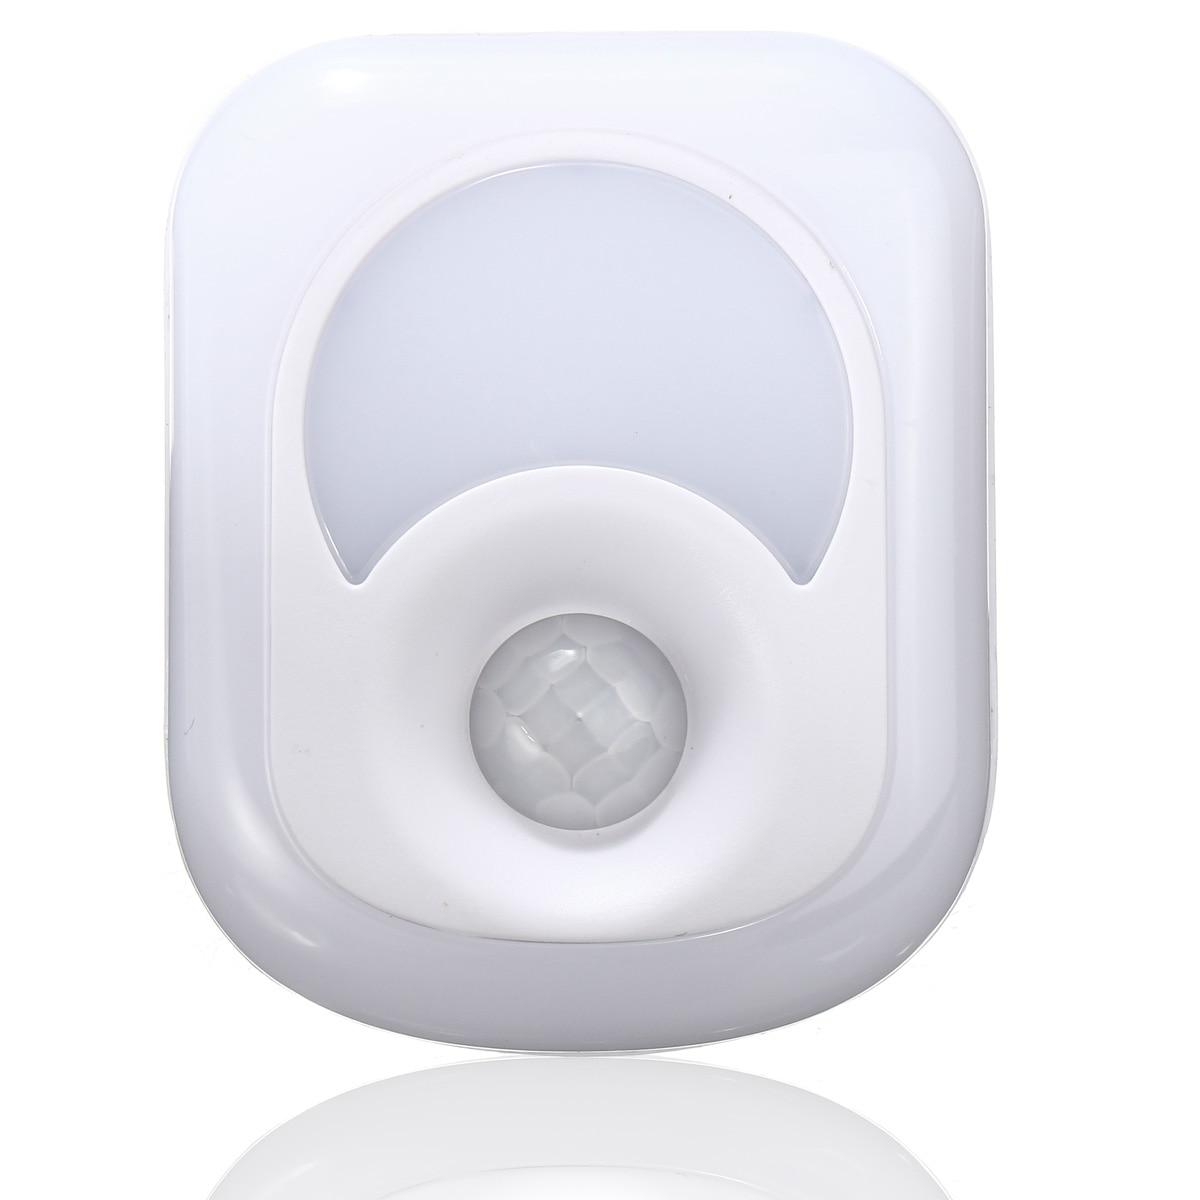 1Pcs White LED Activated Motion Sensor Lamp 26 LED Night Light for Bedroom Cabinet Hallway Home Sensor LED Lights